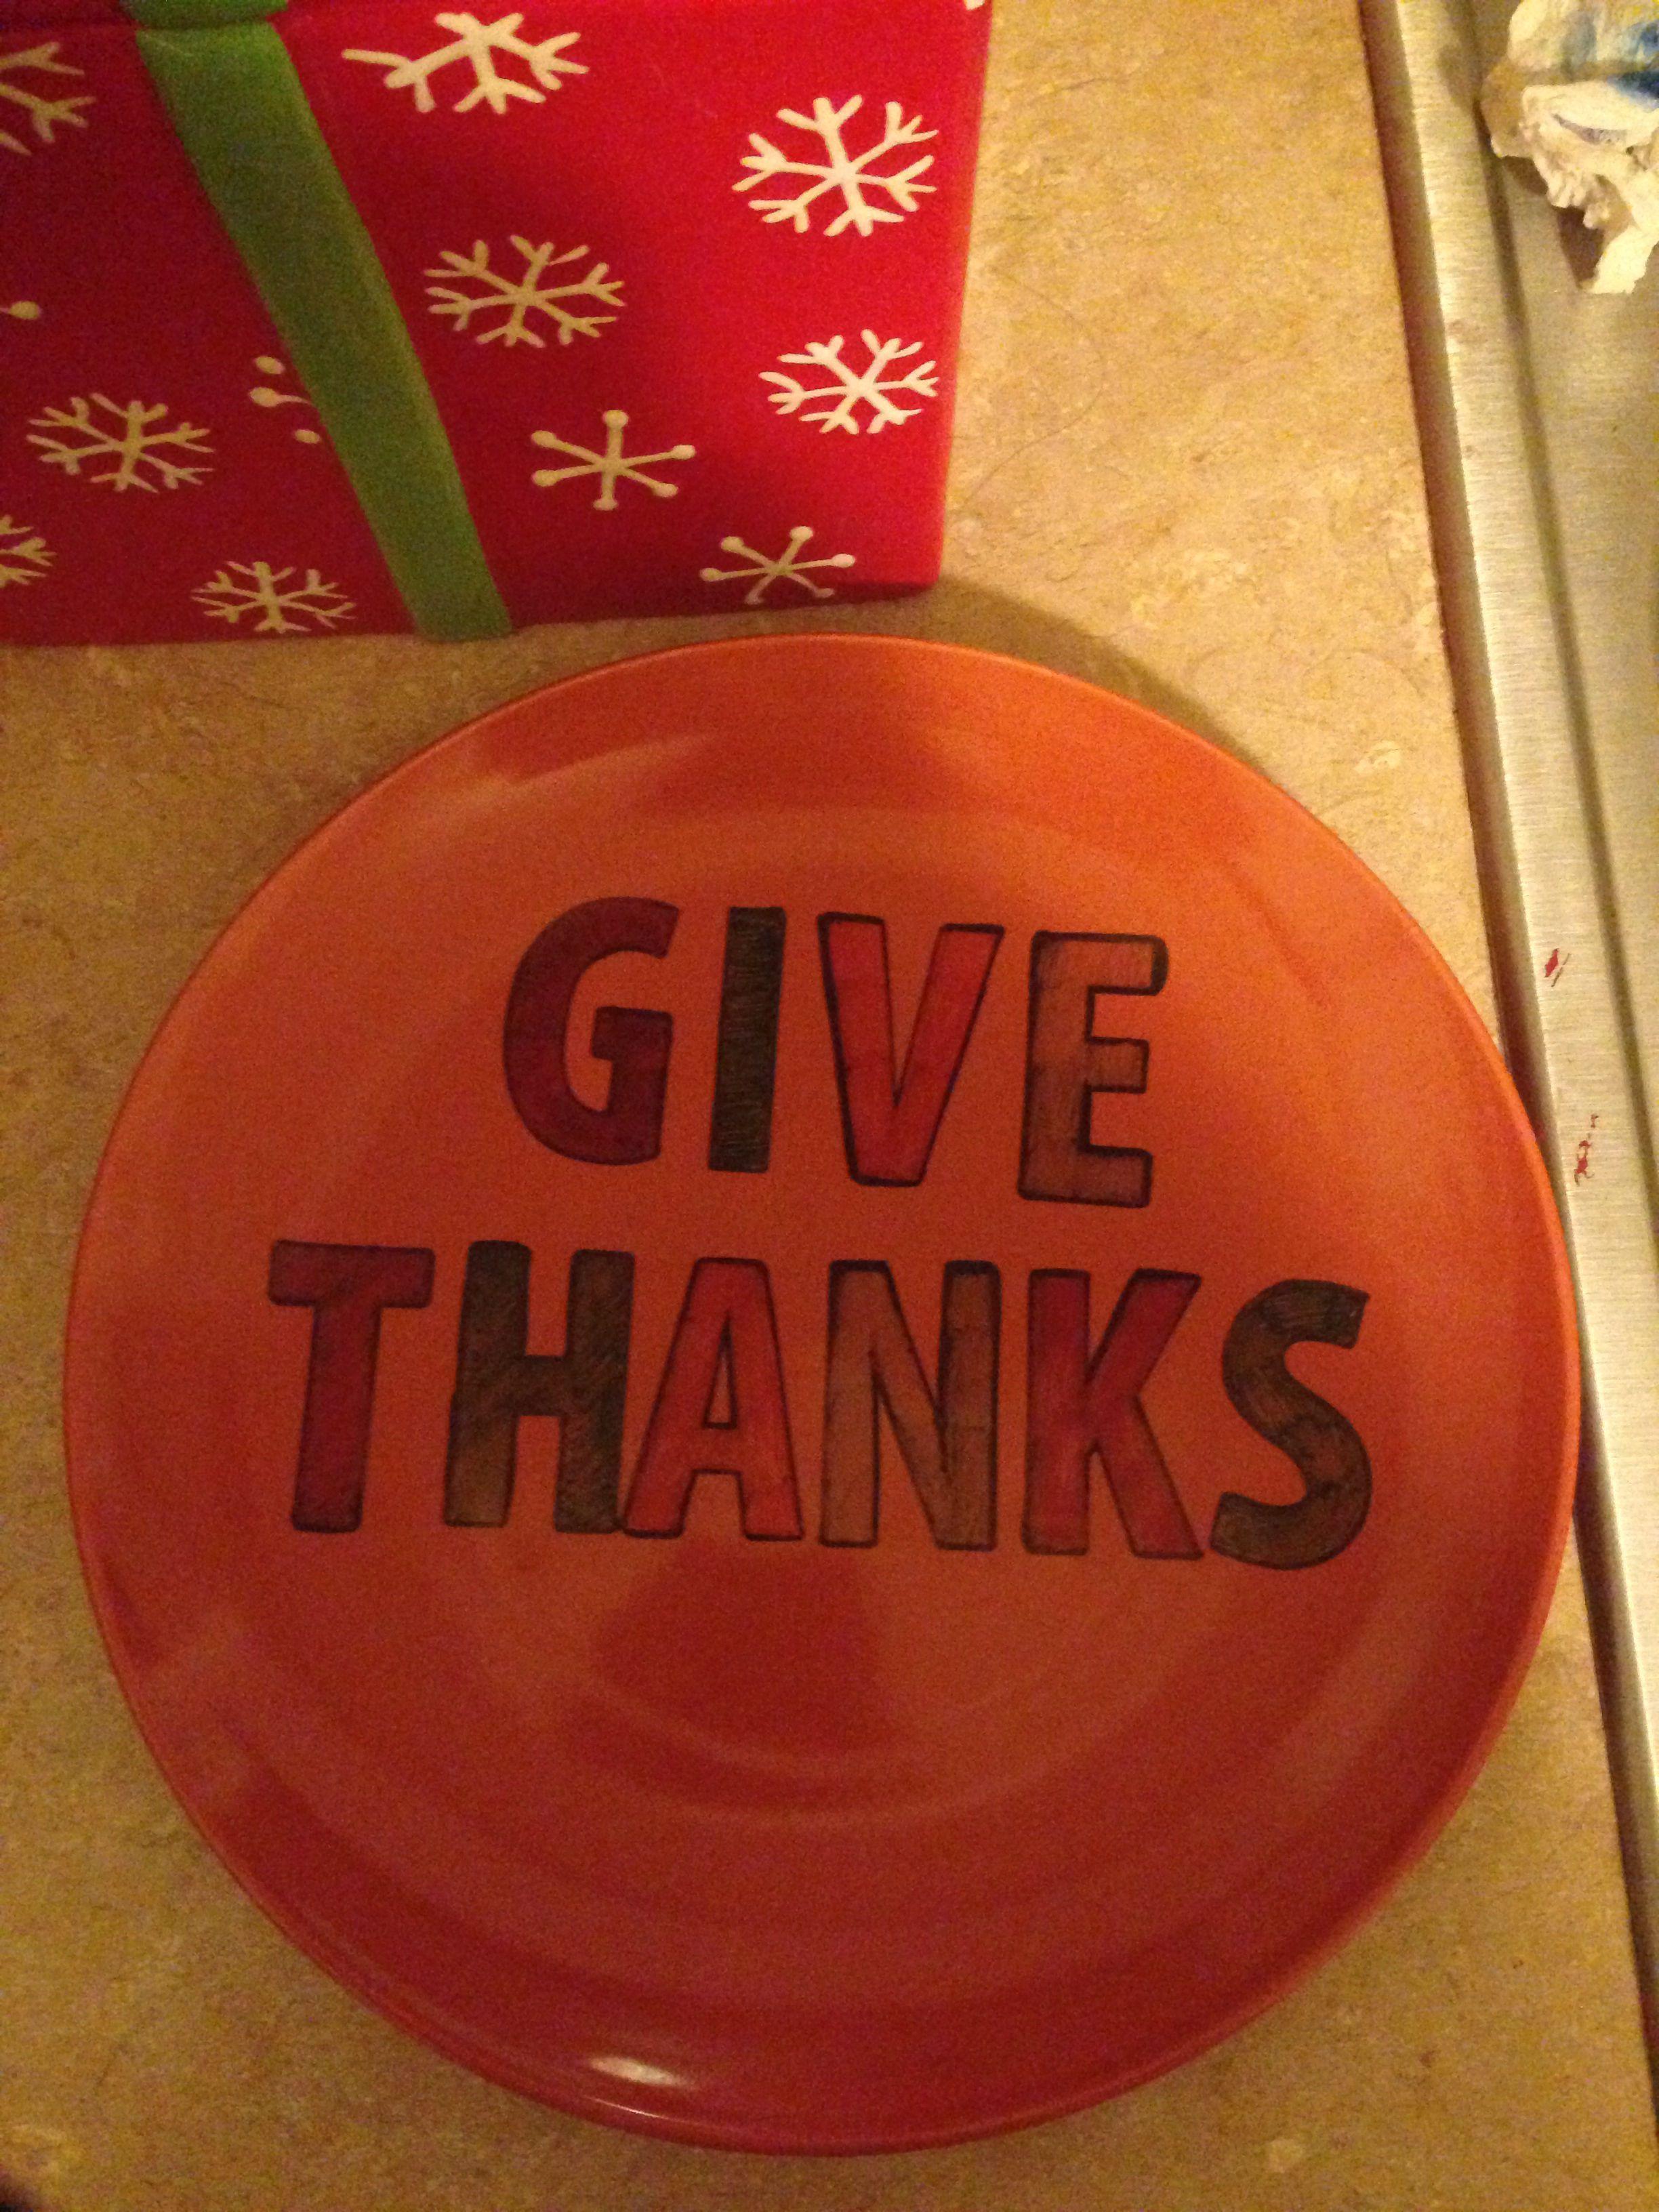 DIY sharpie plates - For Sunday School class - I'm thankful for... #sharpieplates DIY sharpie plates - For Sunday School class - I'm thankful for... #sharpieplates DIY sharpie plates - For Sunday School class - I'm thankful for... #sharpieplates DIY sharpie plates - For Sunday School class - I'm thankful for... #sharpieplates